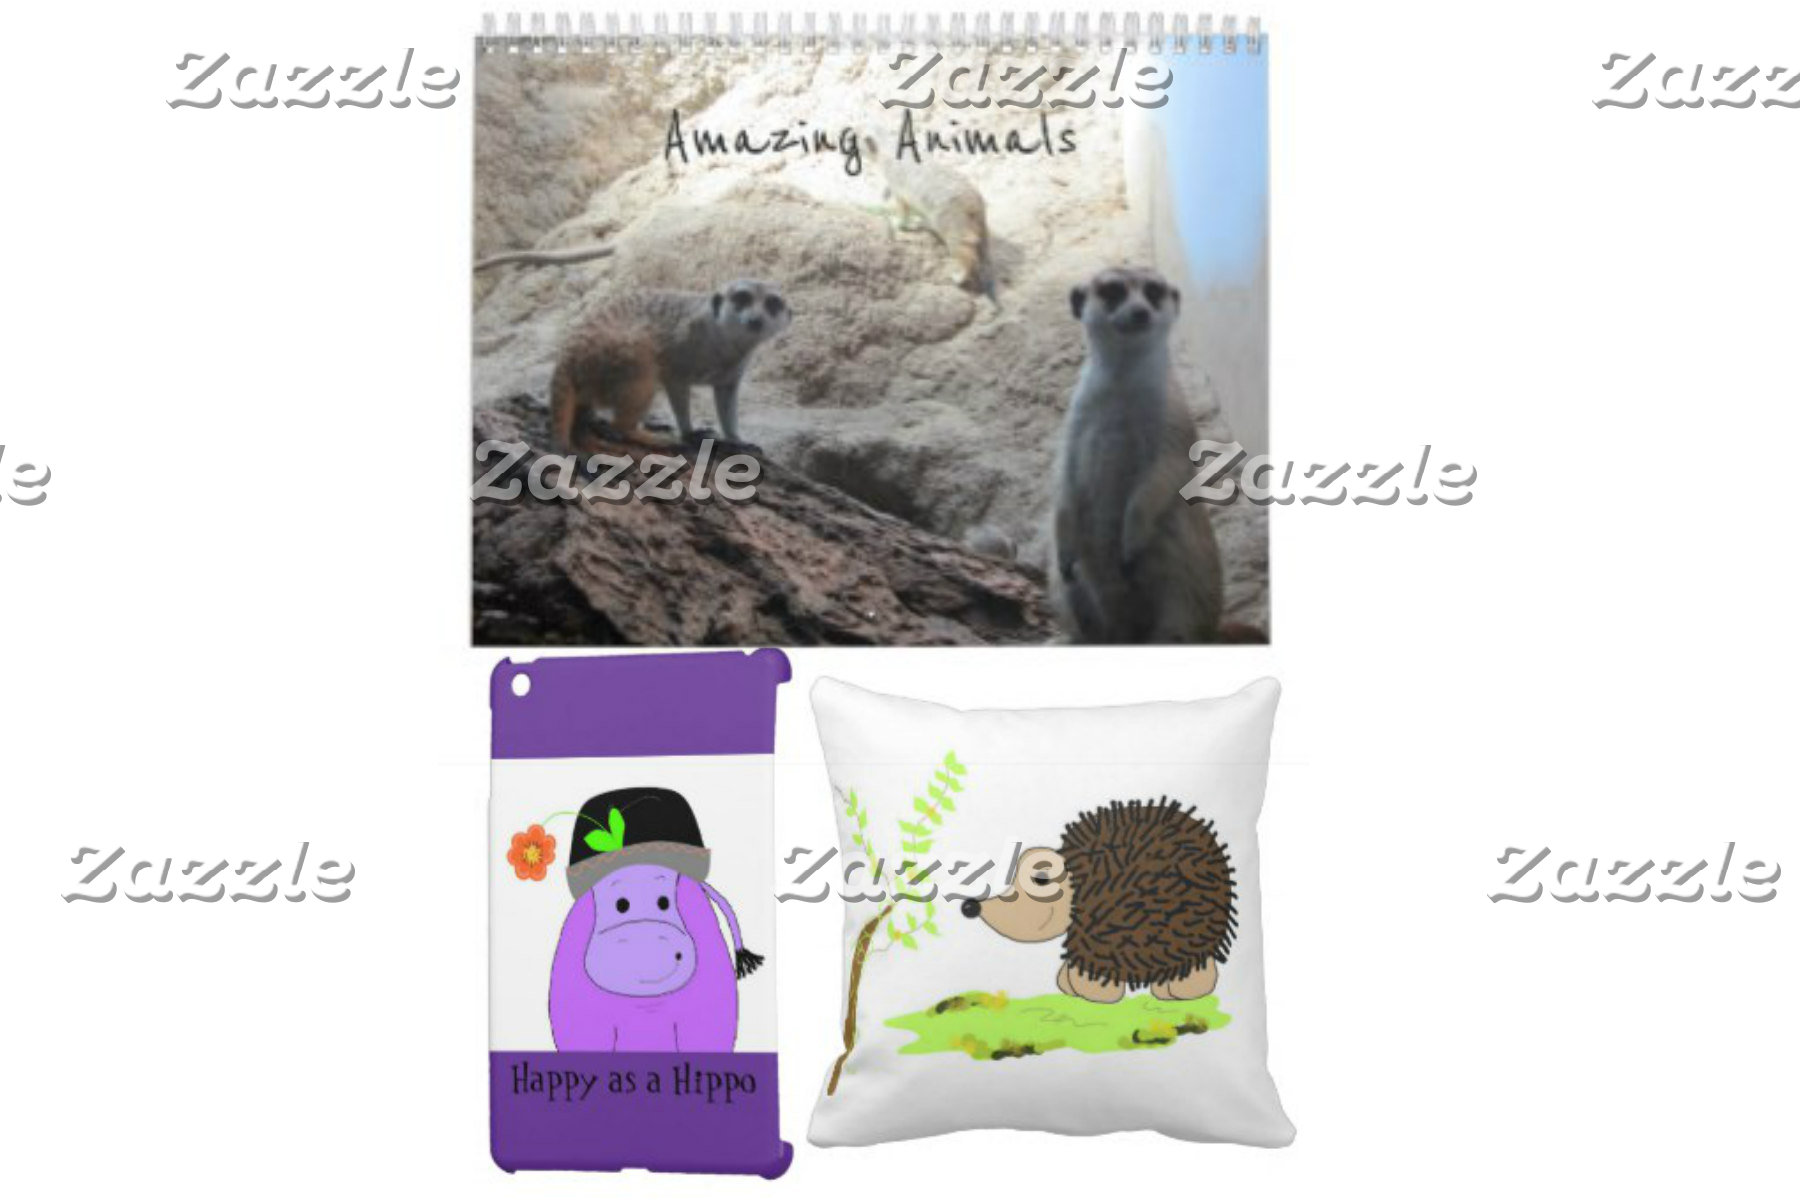 Animal Designs, Cartoon and Photography